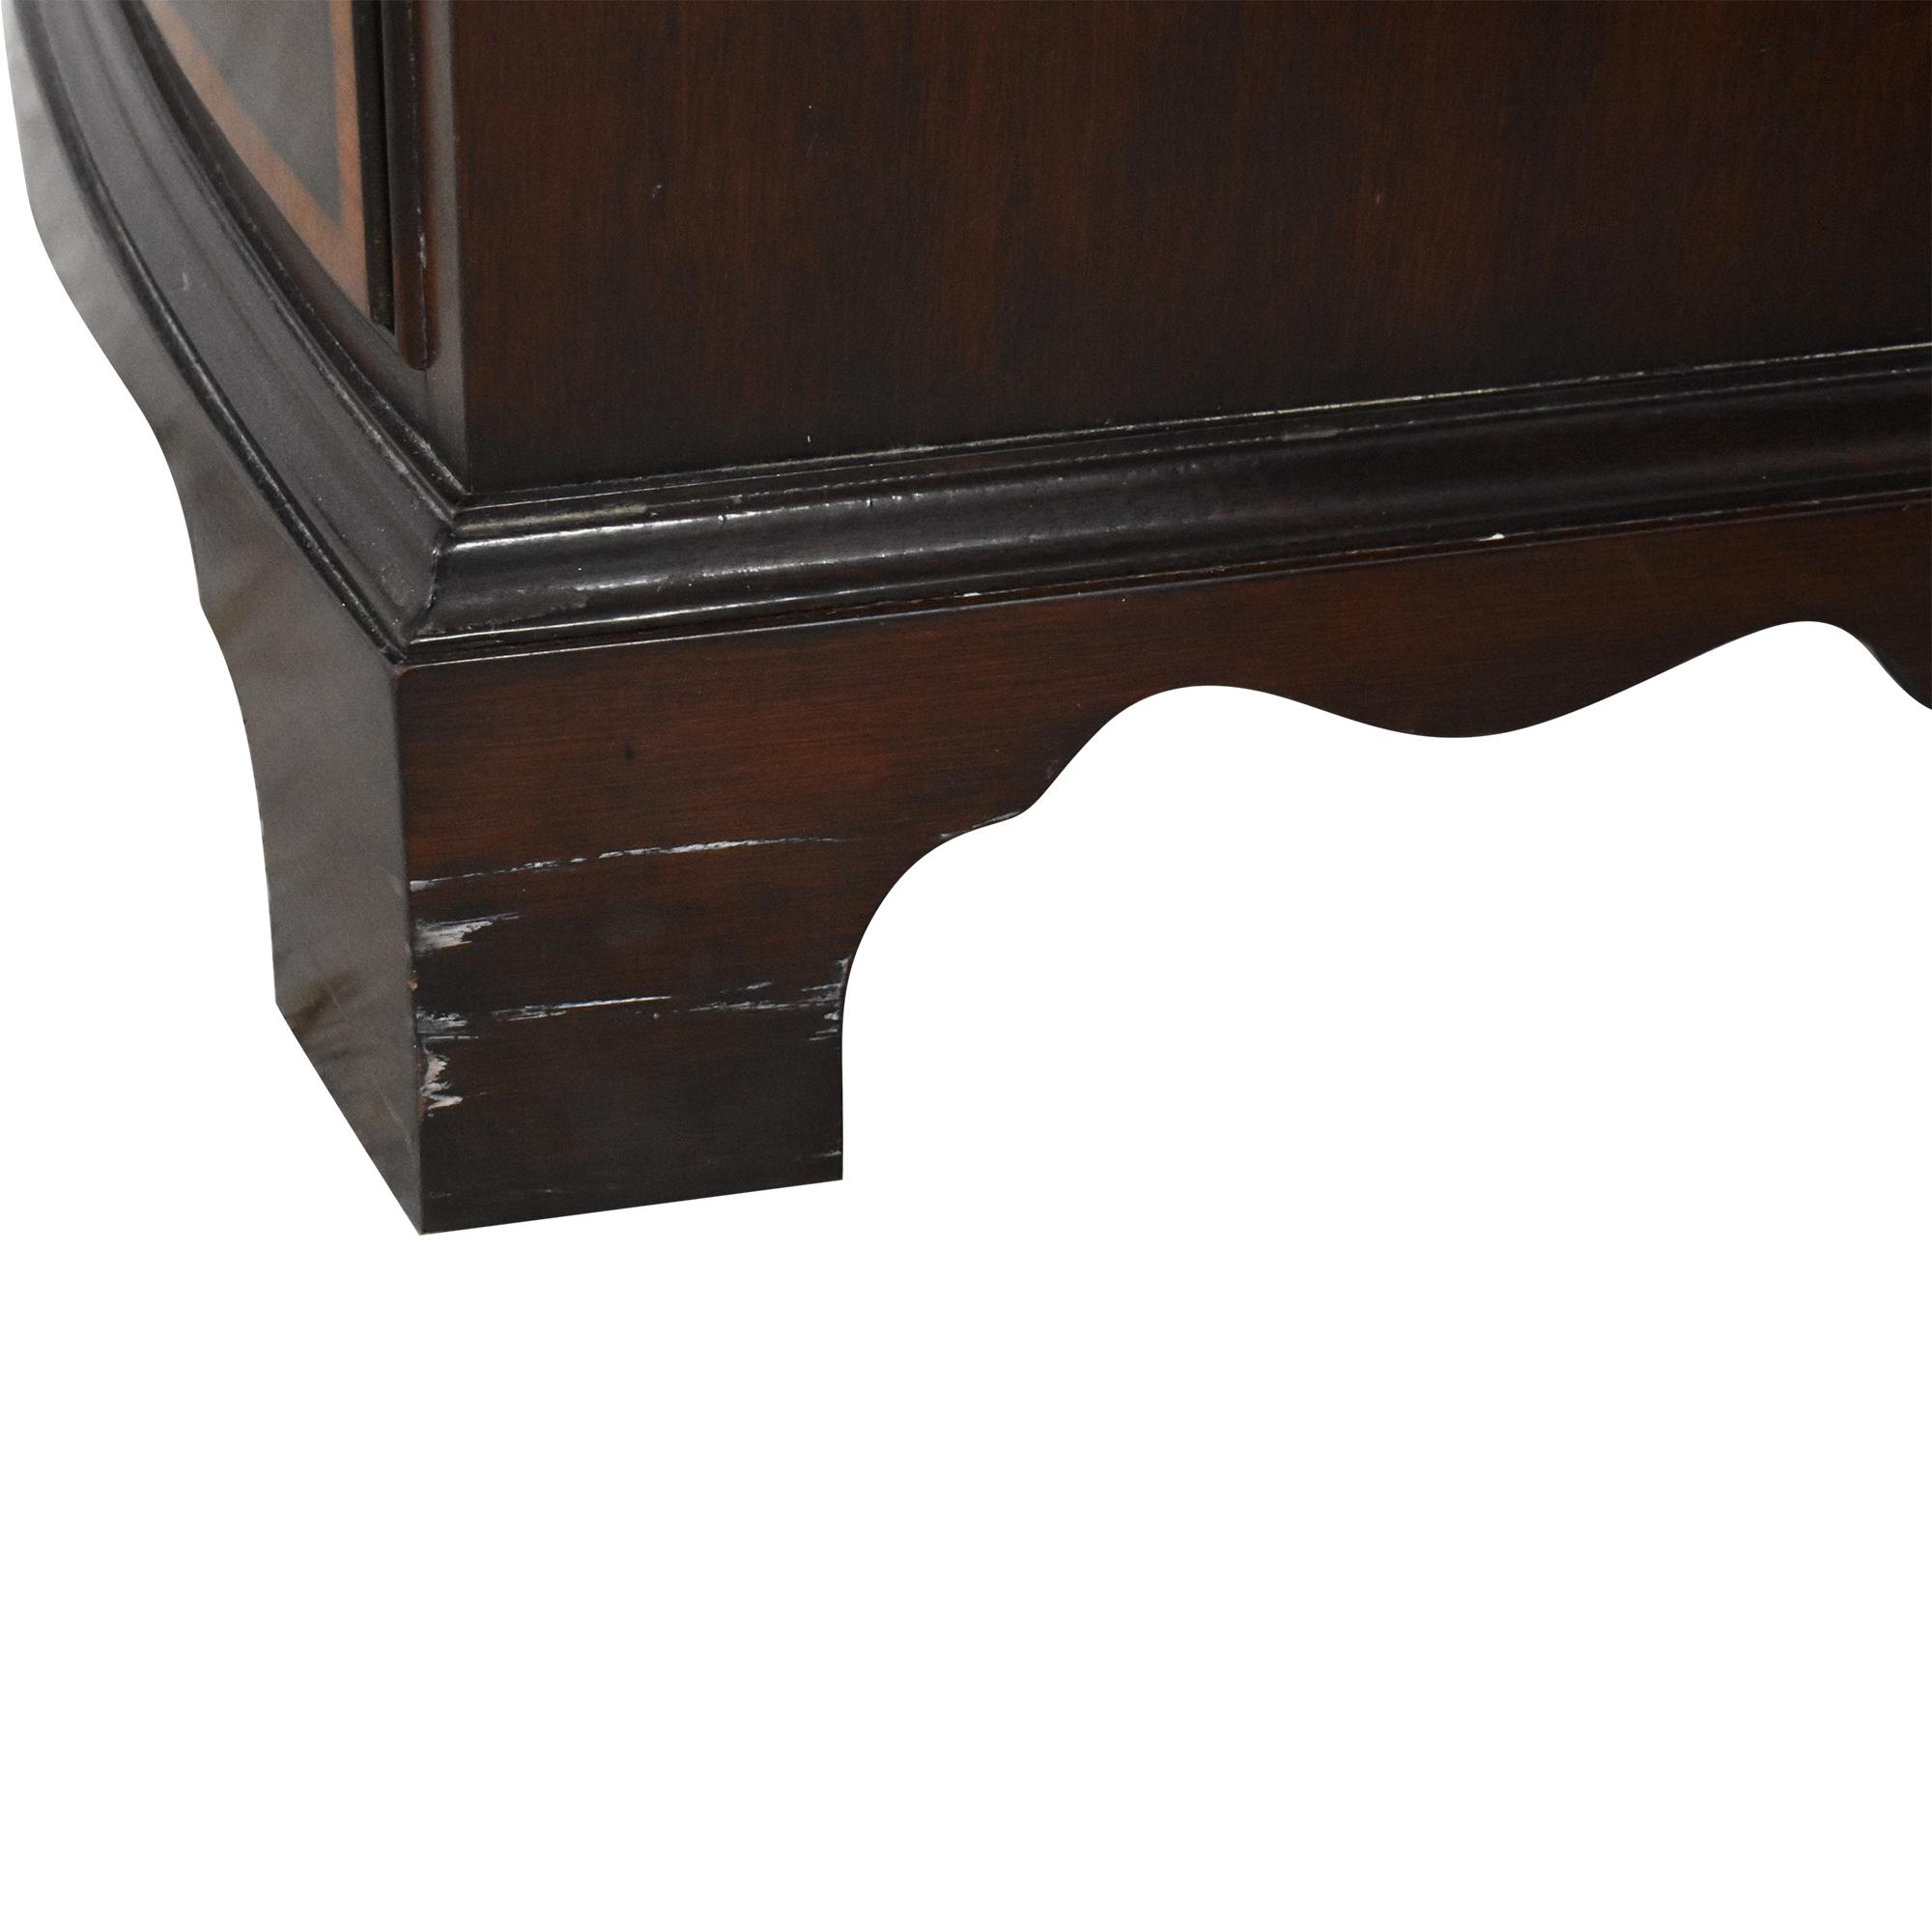 buy Pennsylvania House Pennsylvania House Four Drawer Nightstands online